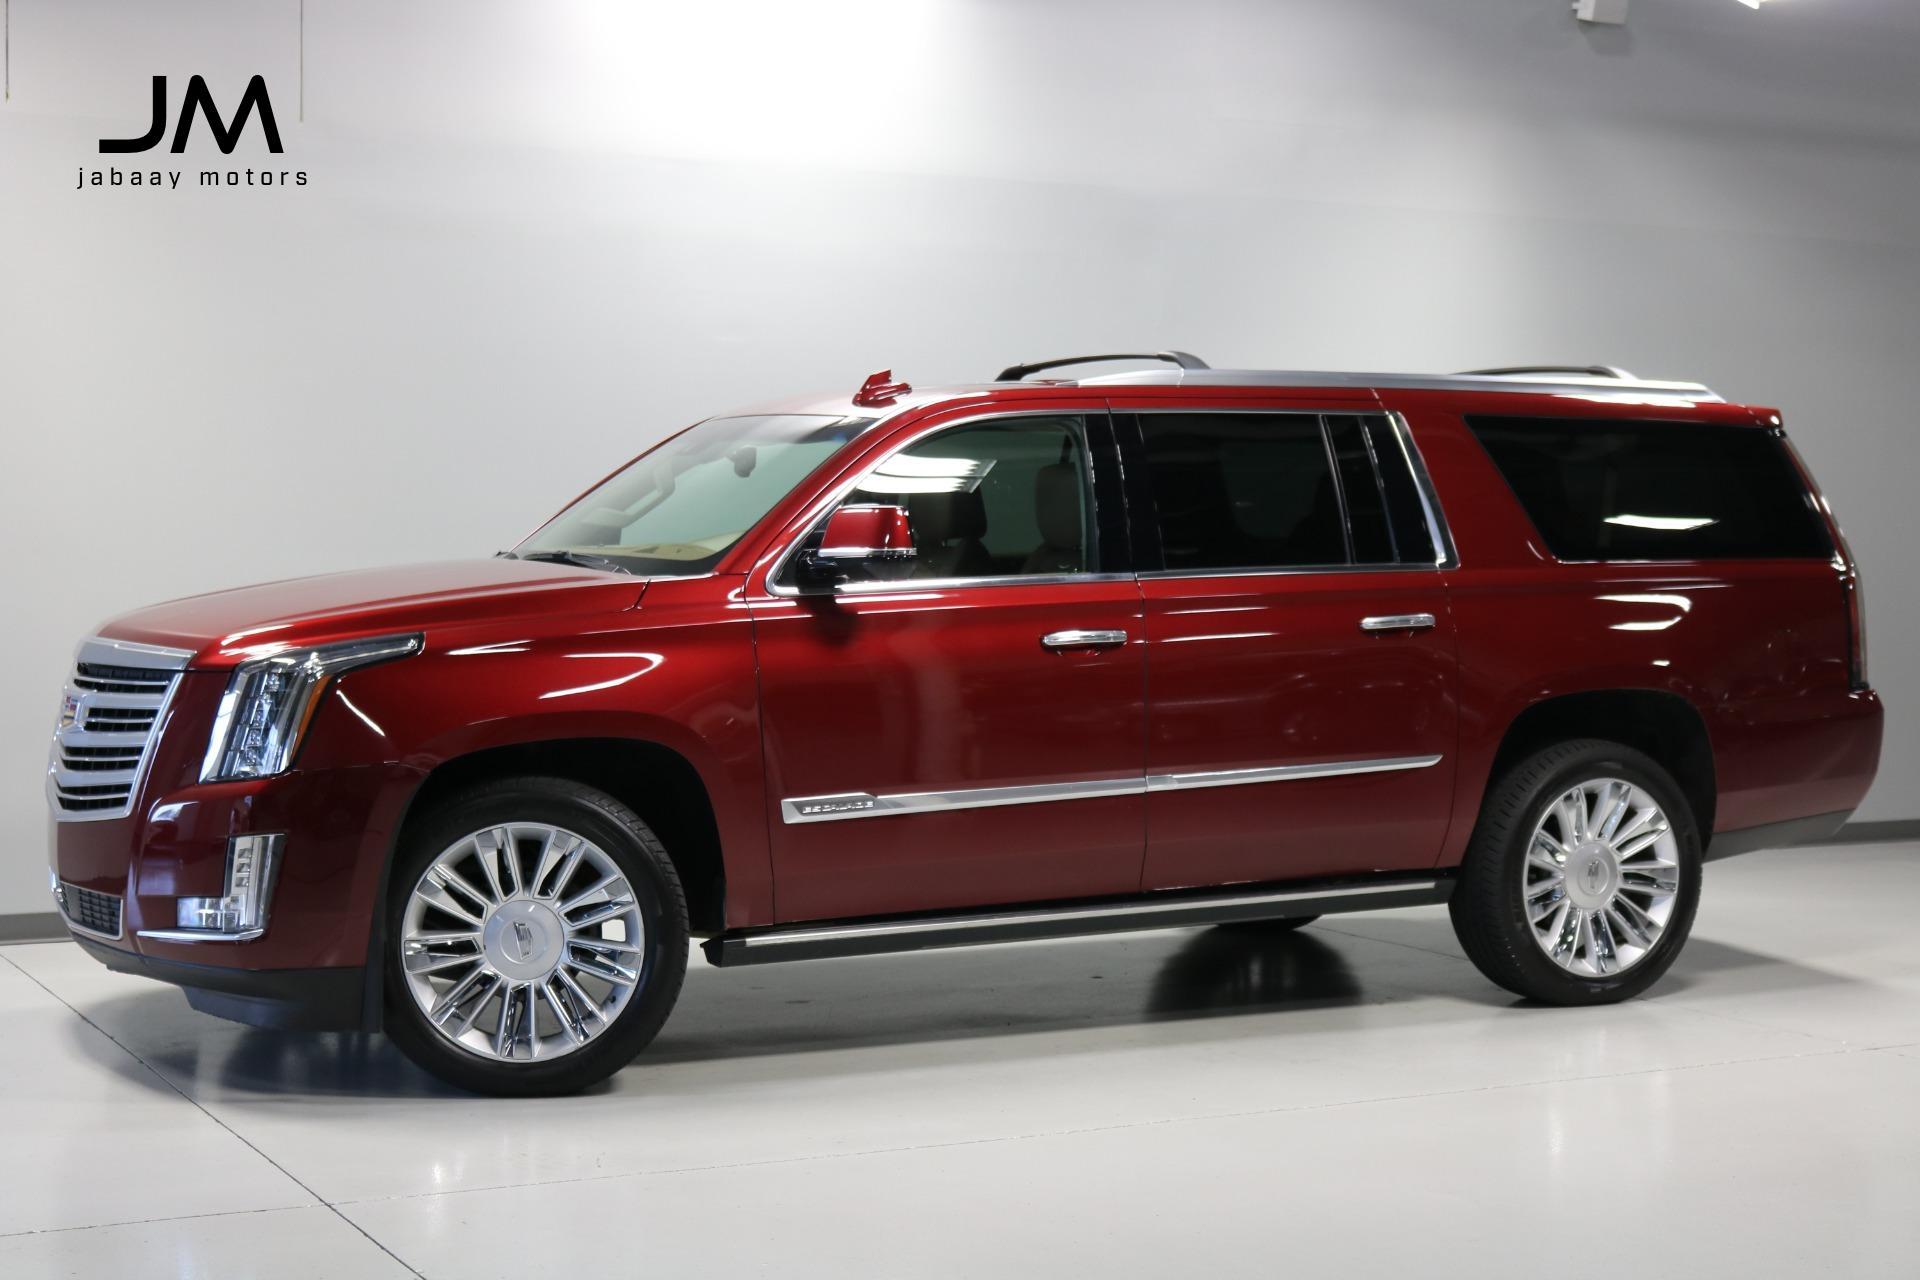 Used 2016 Cadillac Escalade Esv Platinum For Sale Sold Jabaay Motors Inc Stock Jm7283